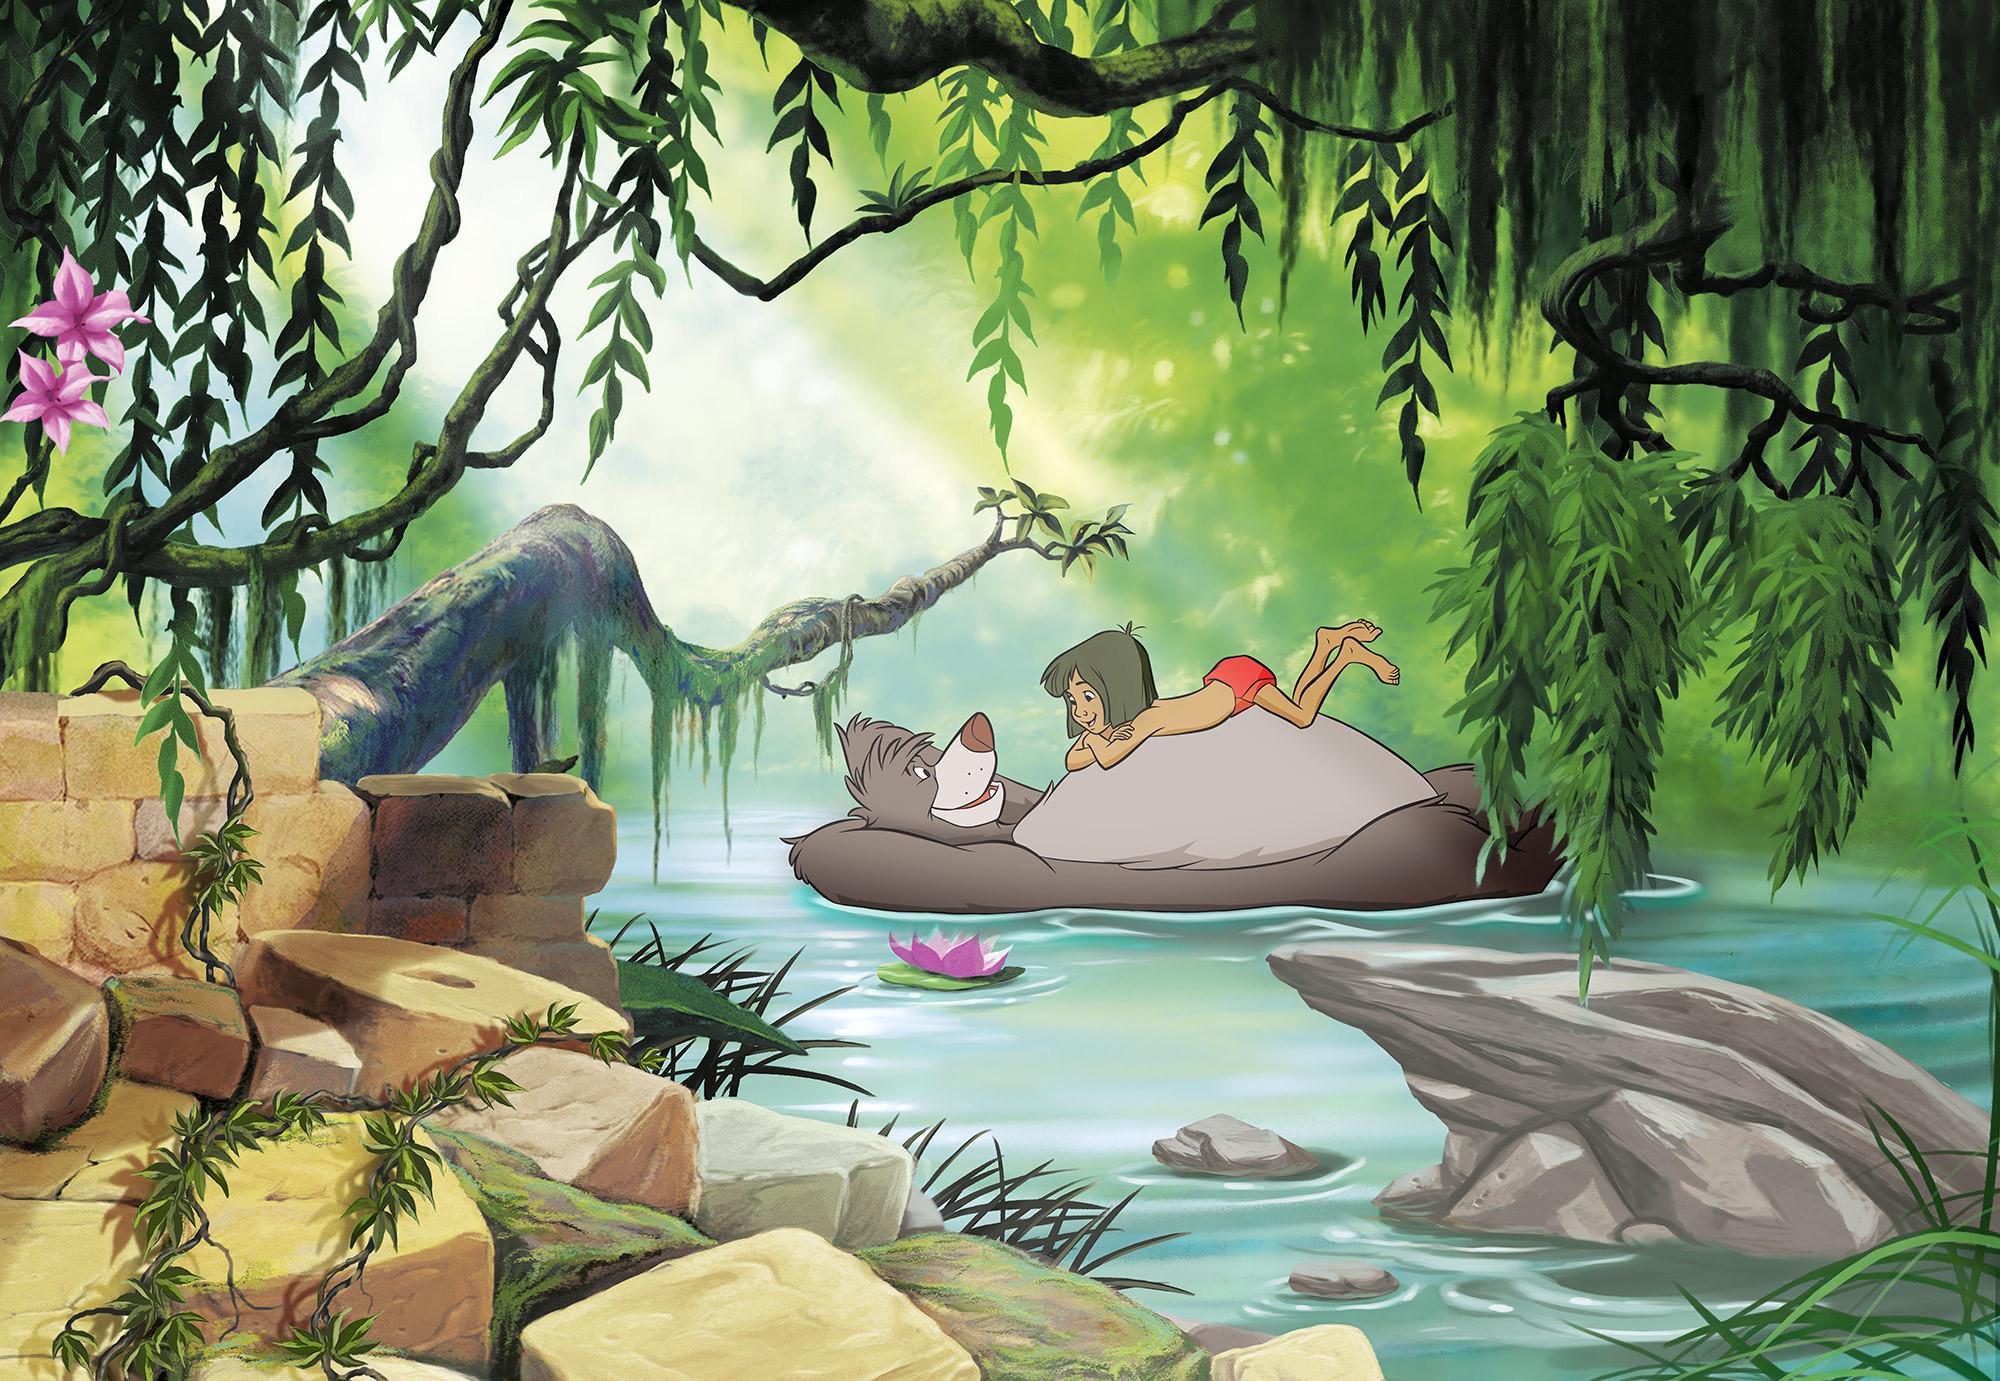 Jungle book swimming with Baloo